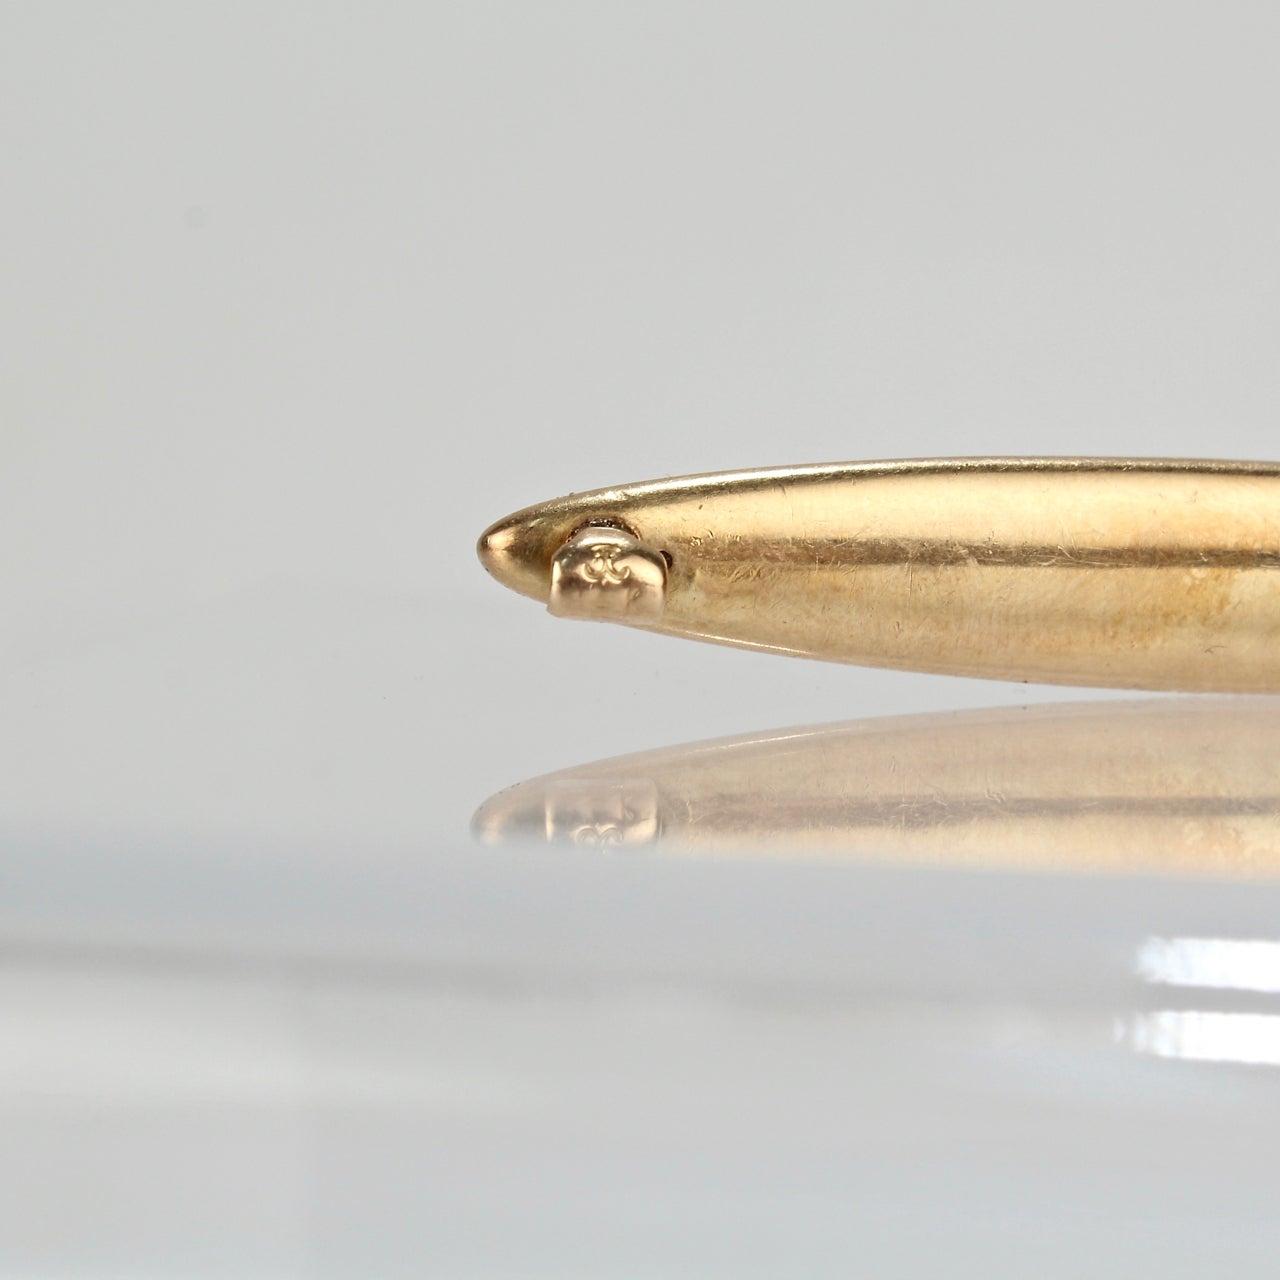 Art Nouveau Period 14 Karat Yellow Gold Lapel Pin with Three Faces by  Krementz